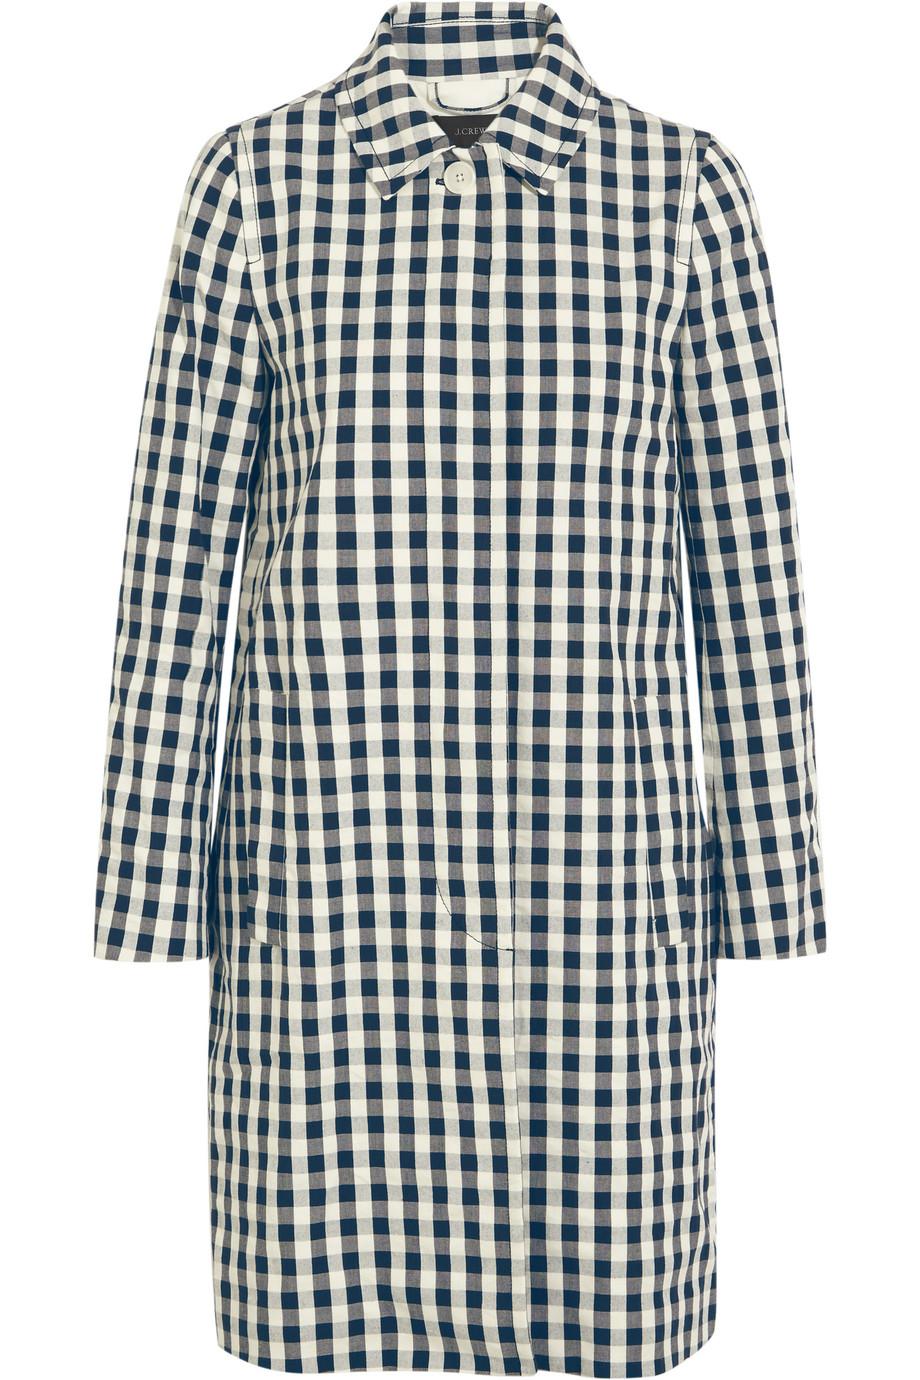 J.Crew Gingham Cotton Trench Coat, Navy, Women's, Size: 10